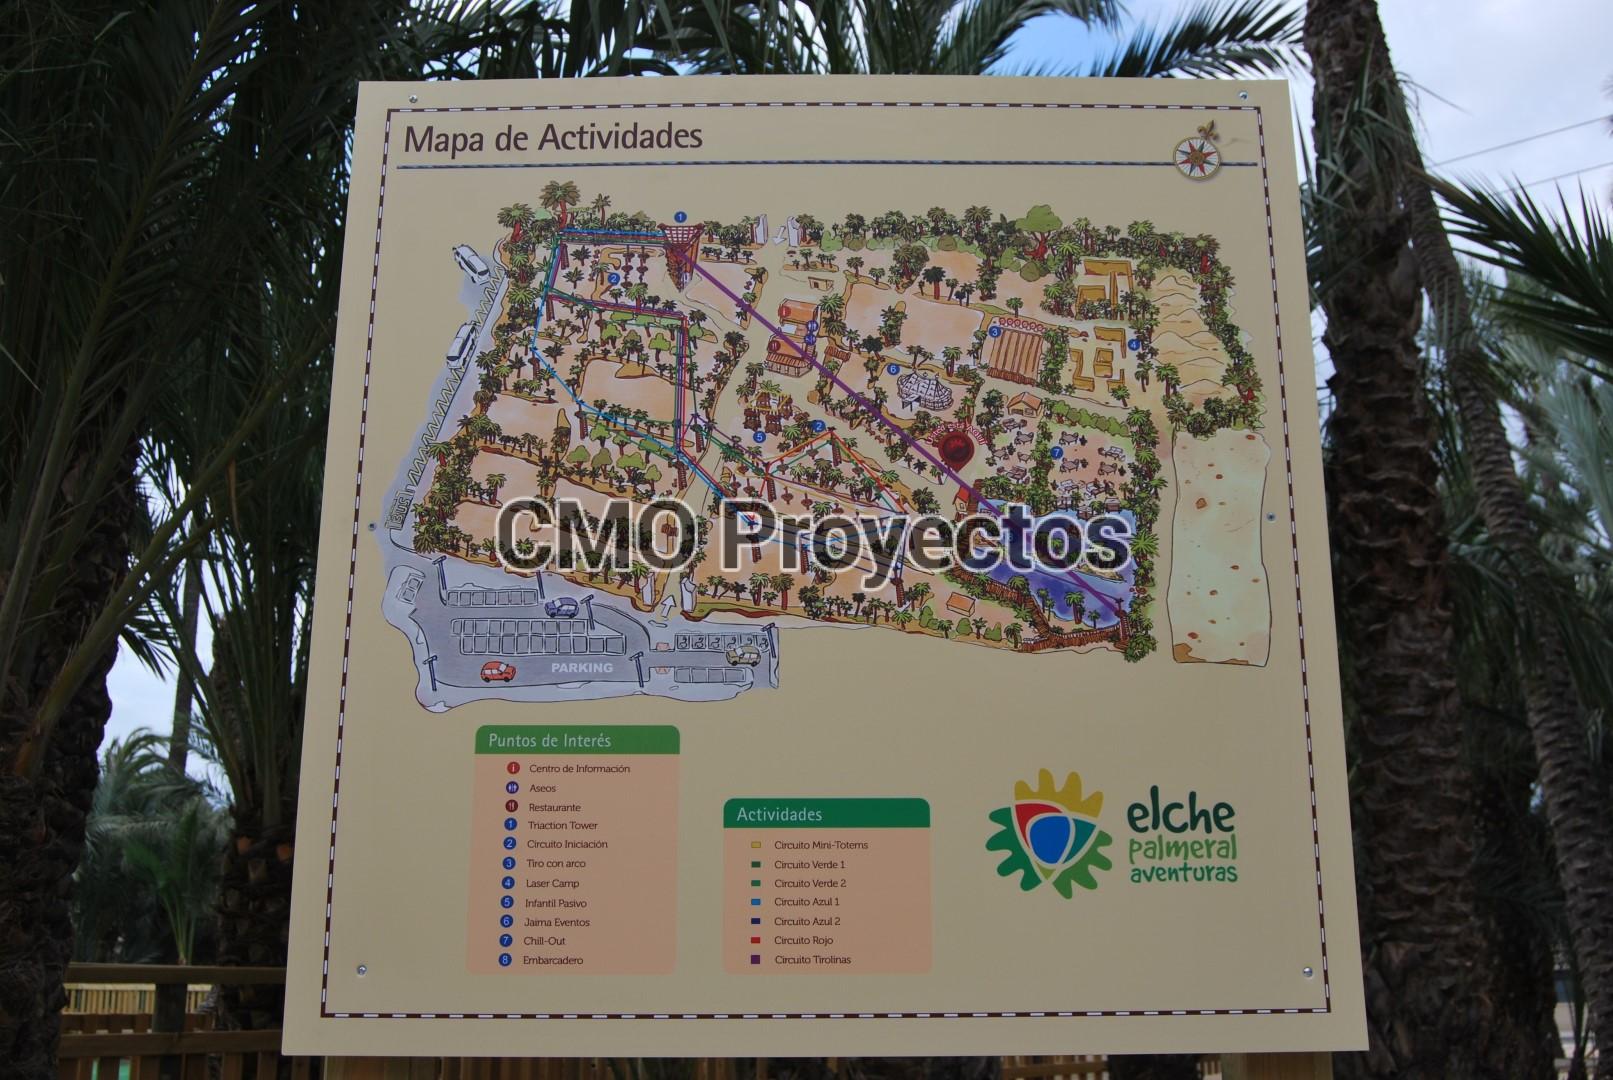 Exploitation Consulting en Parque Multiaventura CMO Proyectos